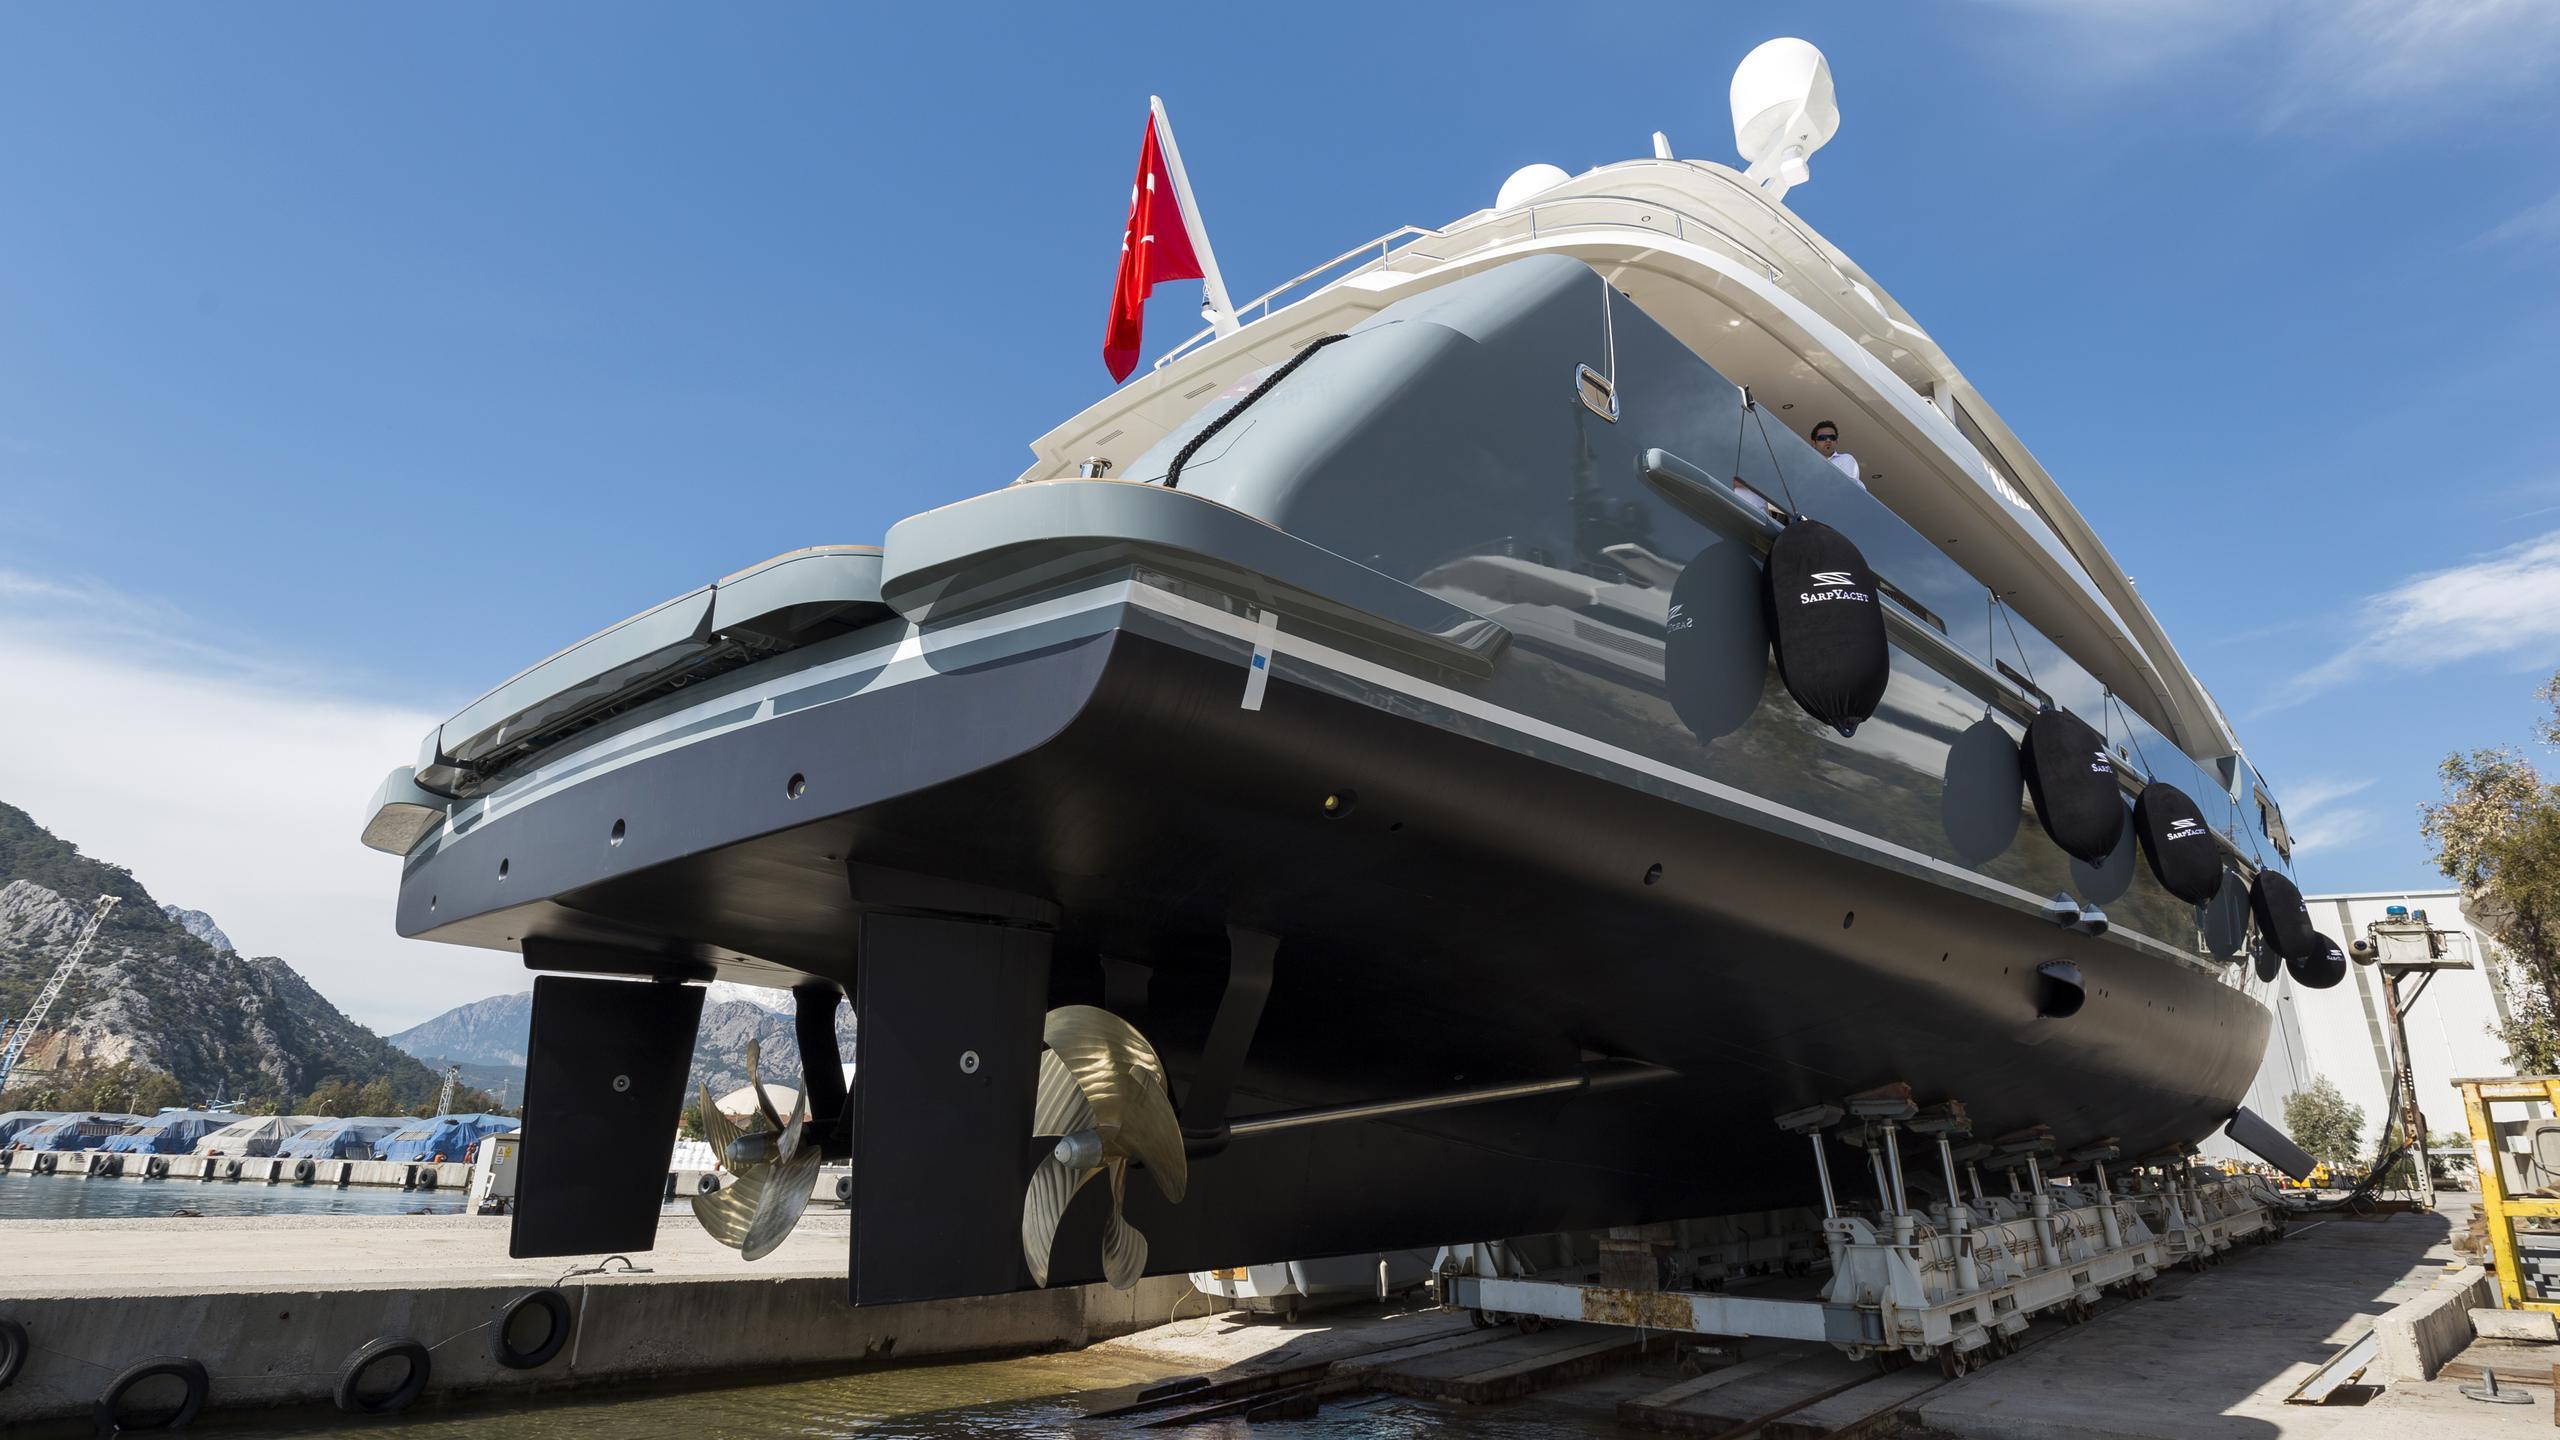 sarp-46-motor-yacht-2016-rear-profile